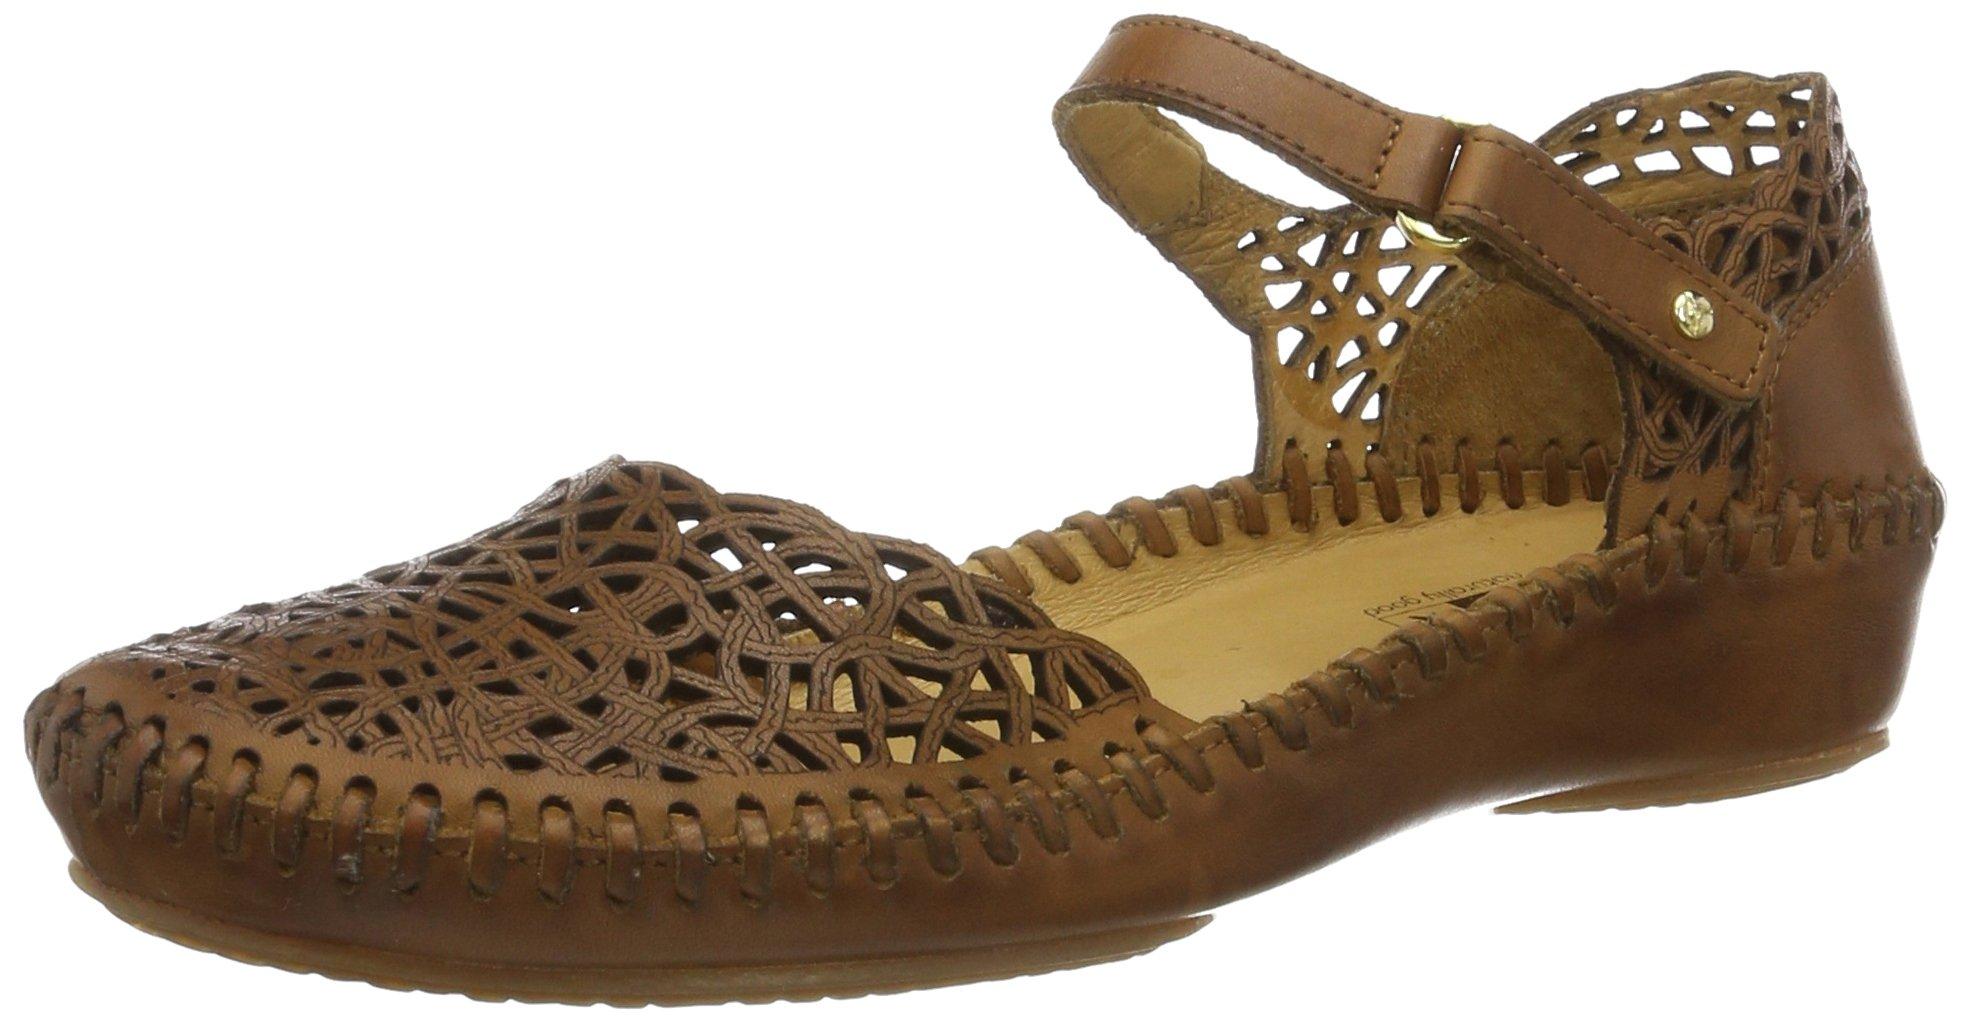 PIKOLINOS Womens Puerto Vallarta Mary Jane Sandal Brandy Size 40 EU (9.5-10 M US Women)